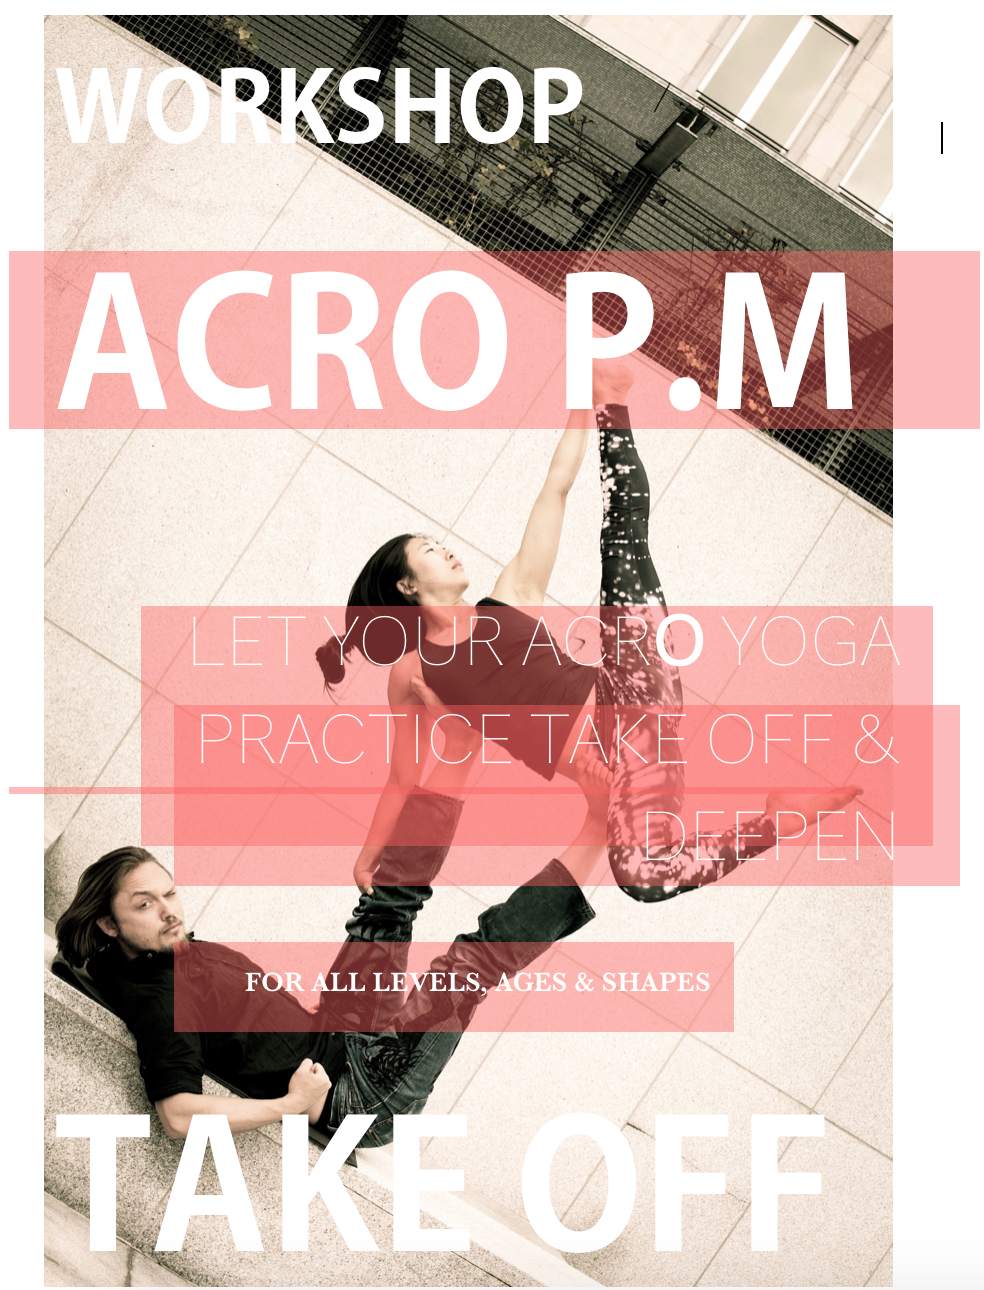 Acro P.M Workshop : Saturday 27th August 3-6pm